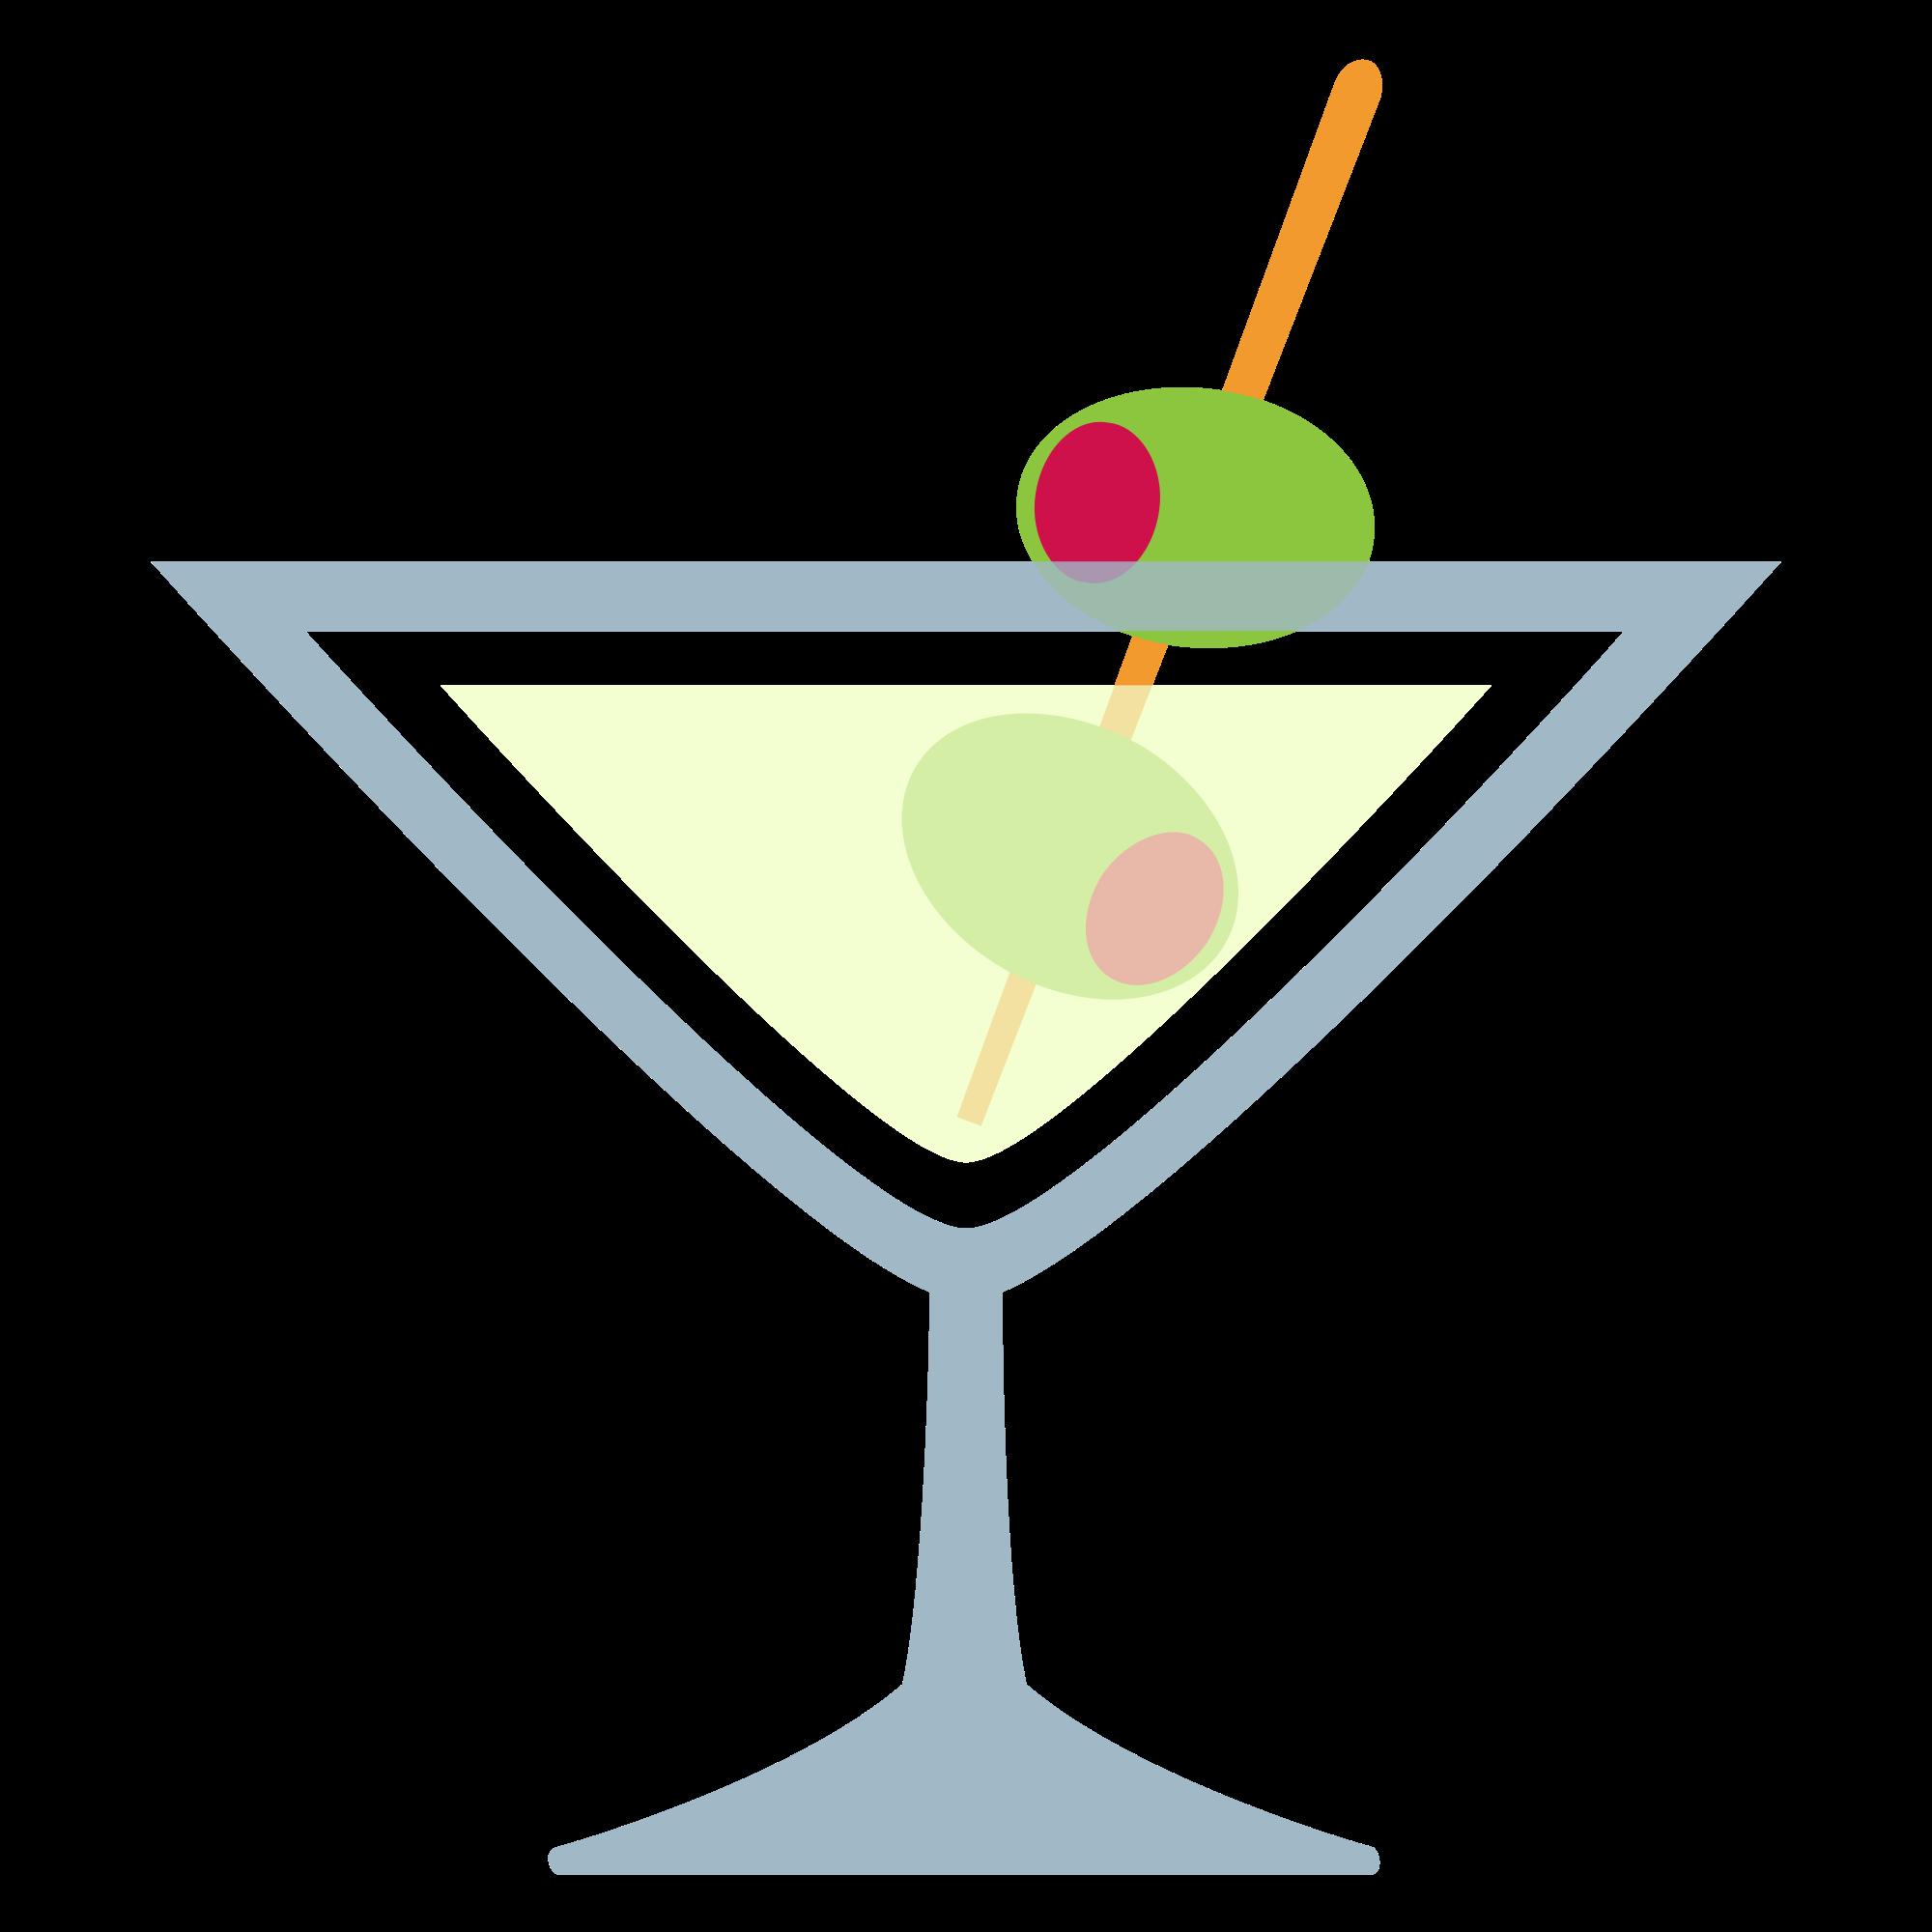 Martini Svg Outline White - Martini Glass Clipart (#3897792) - PikPng